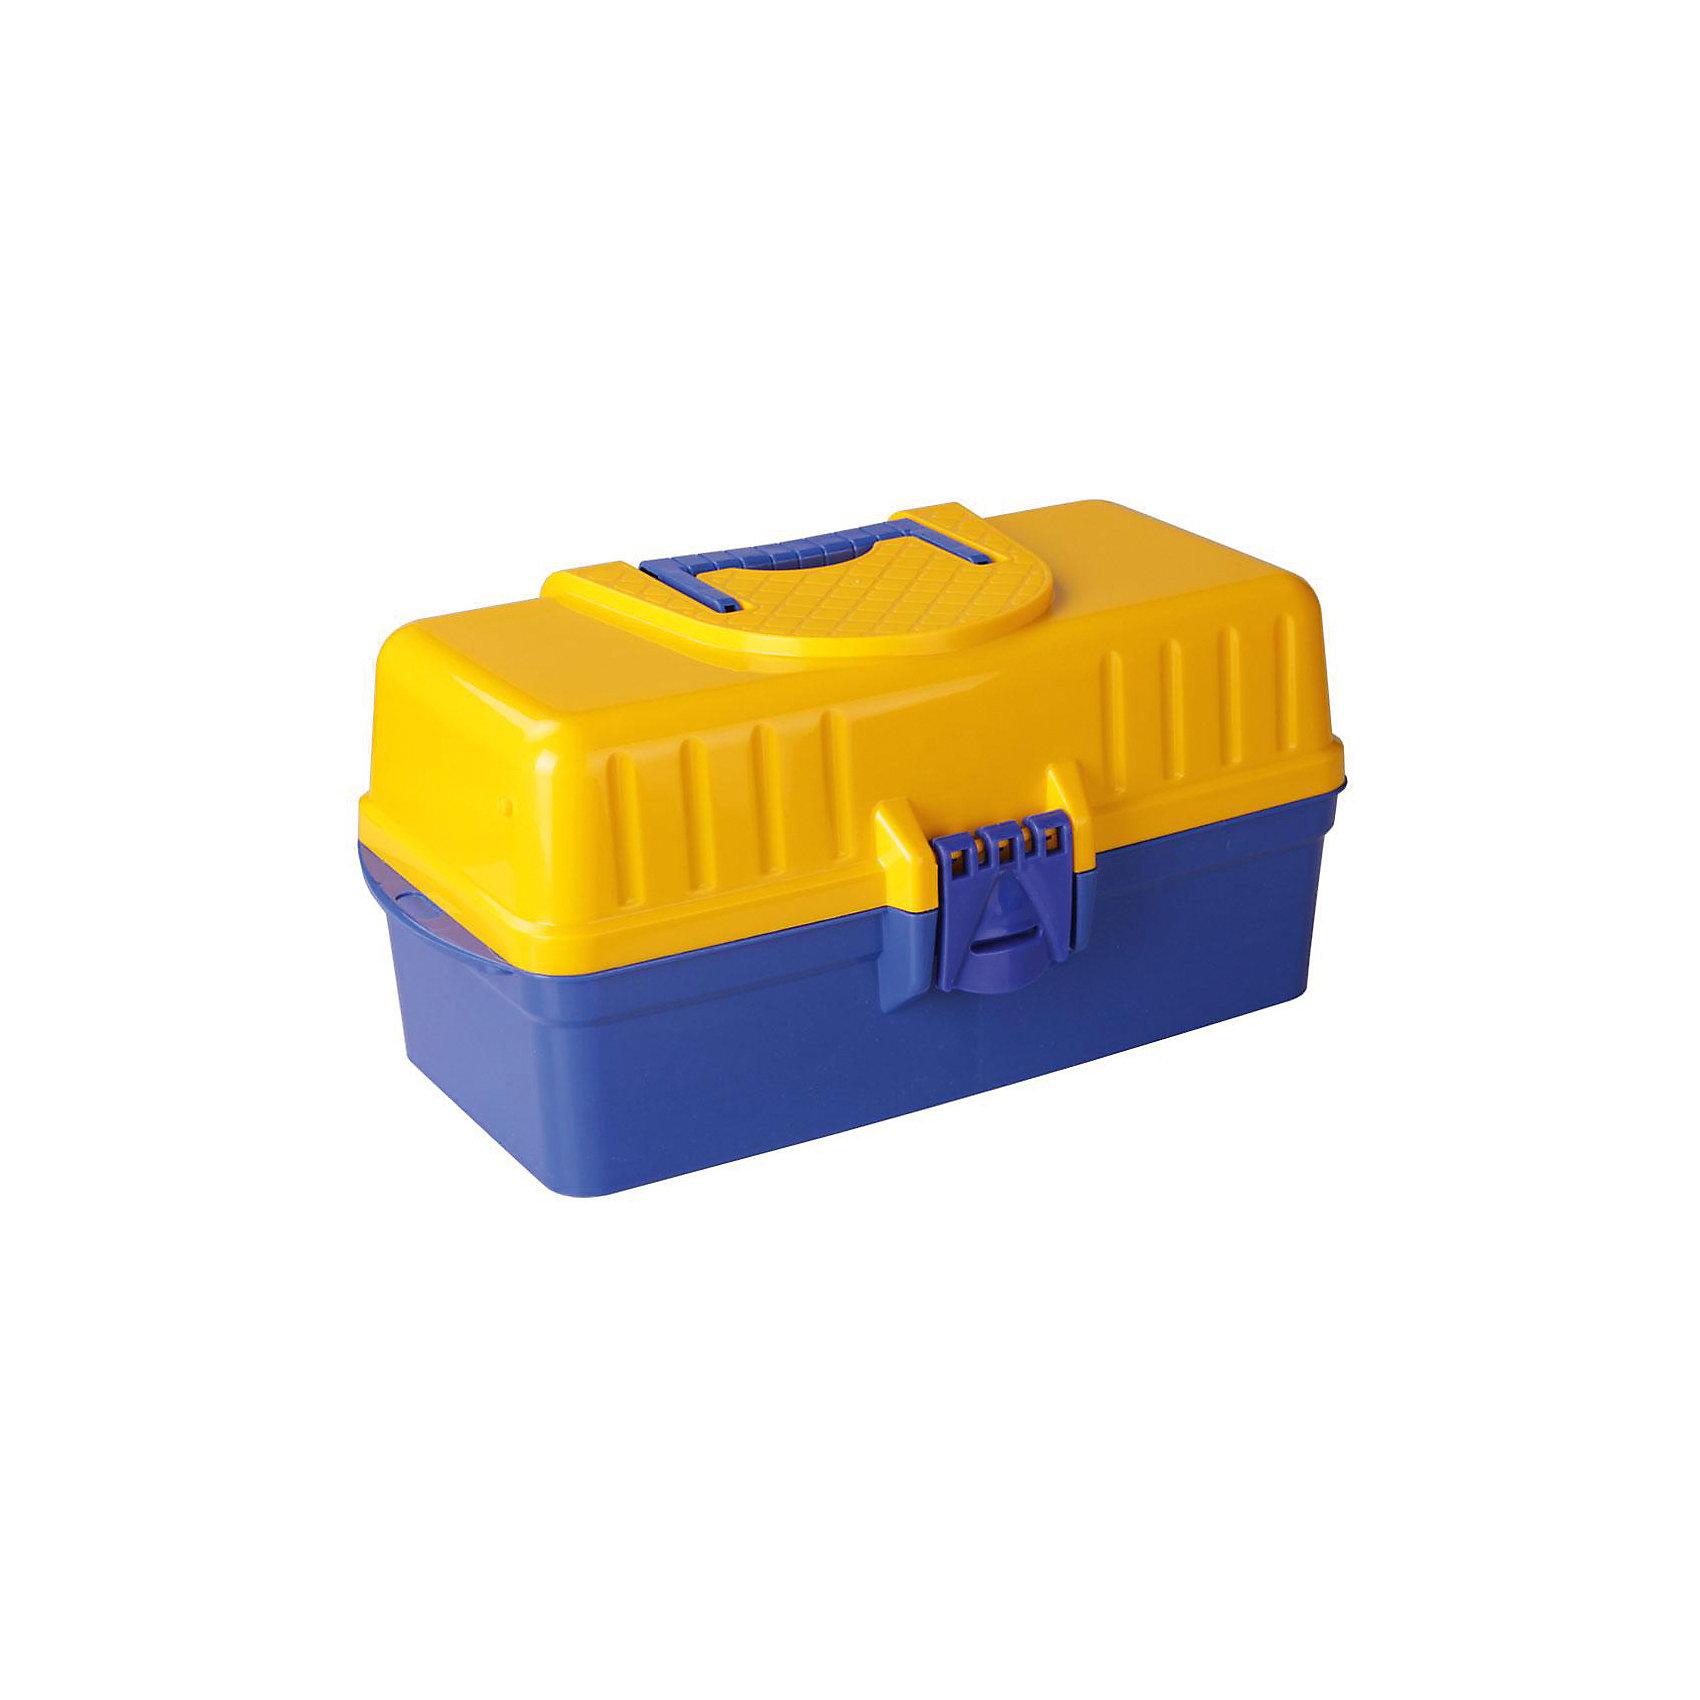 Ящик для инструментов (425х224х200), Alternativa, синий-желтый